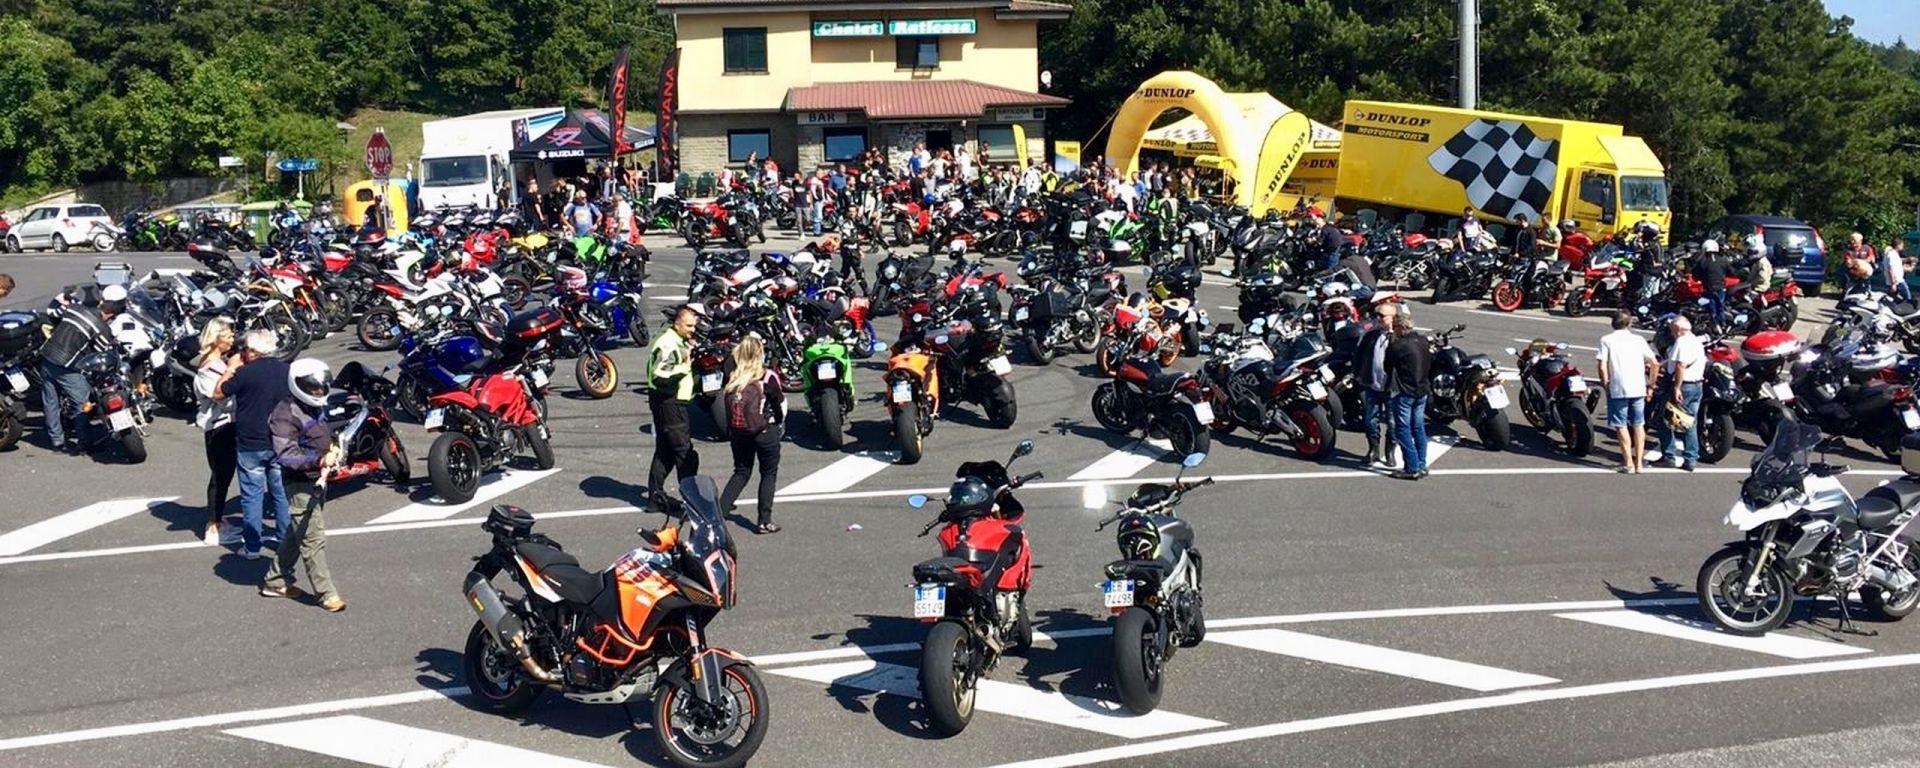 Suzuki Katana Hill Climb Tour: il raduno